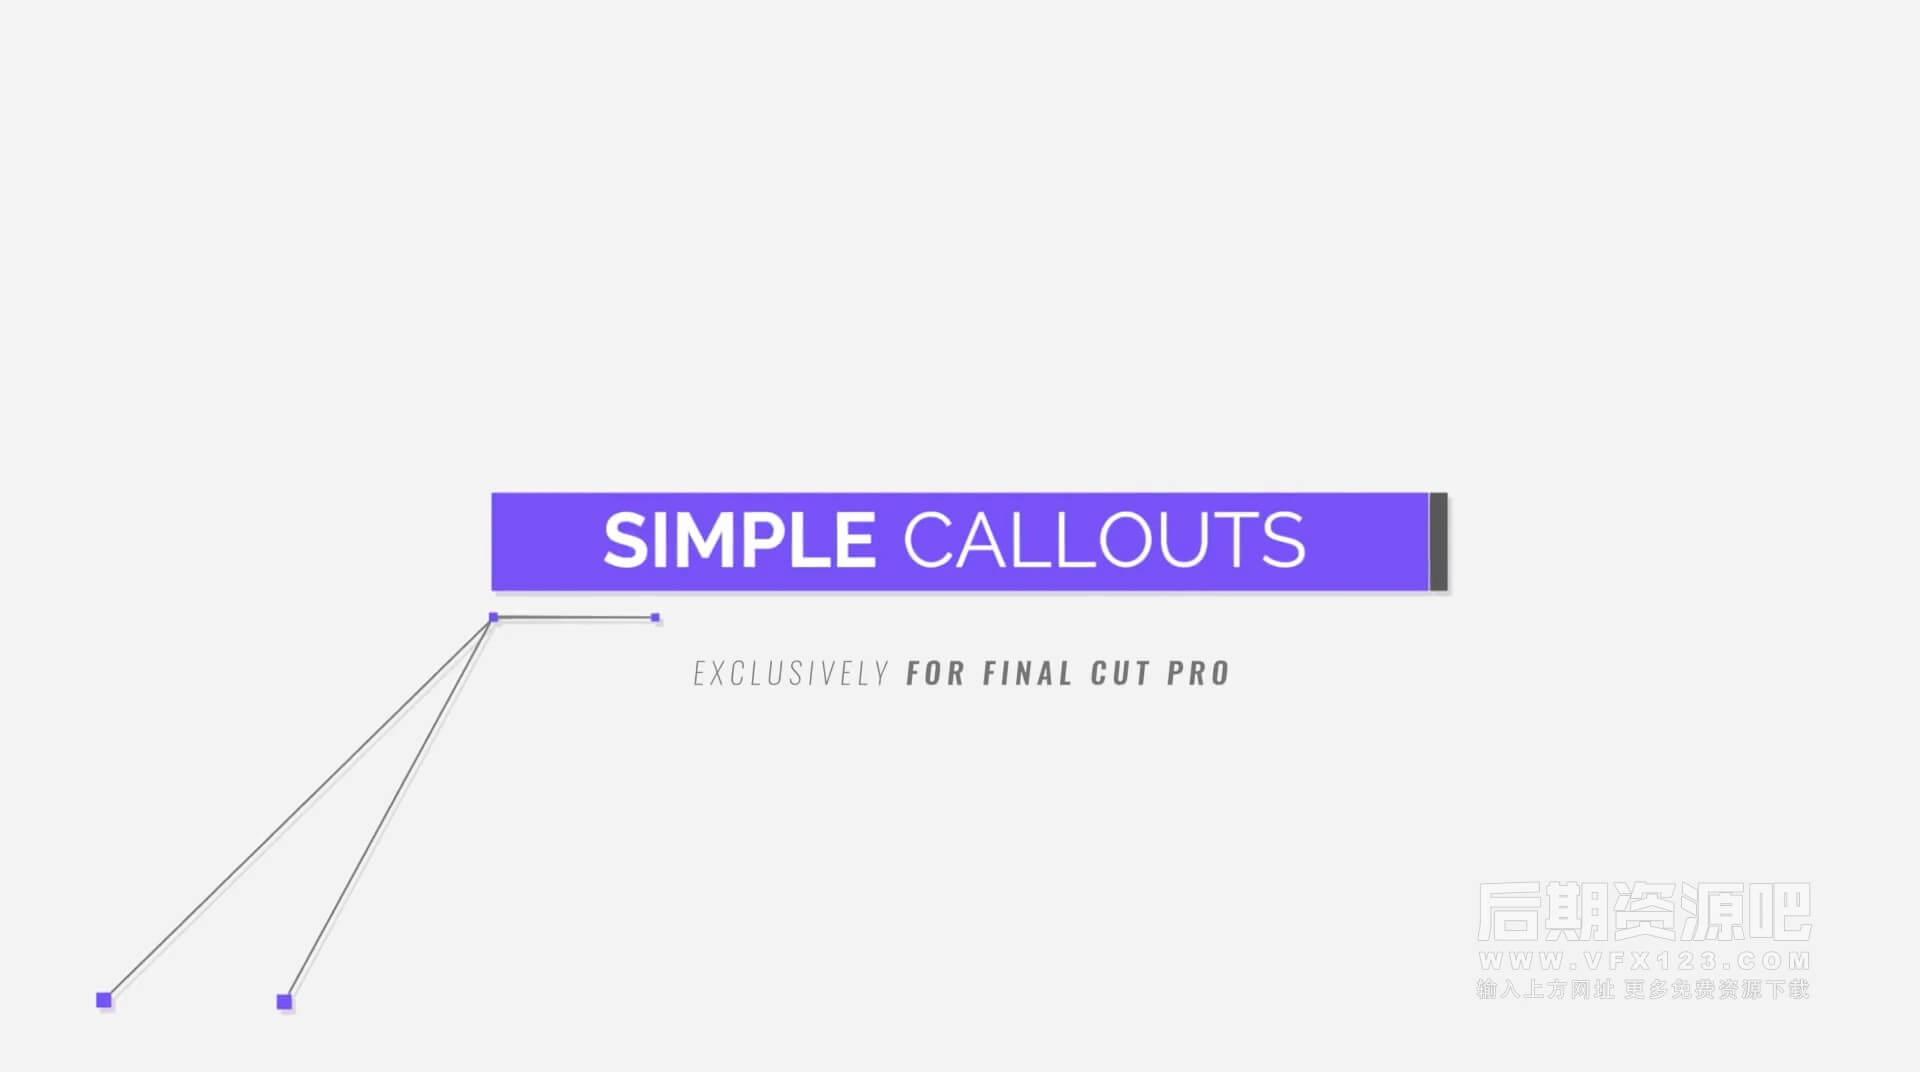 Fcpx插件 20个4K简洁多点标注注释解释线框线条呼出动画 Simple Callouts